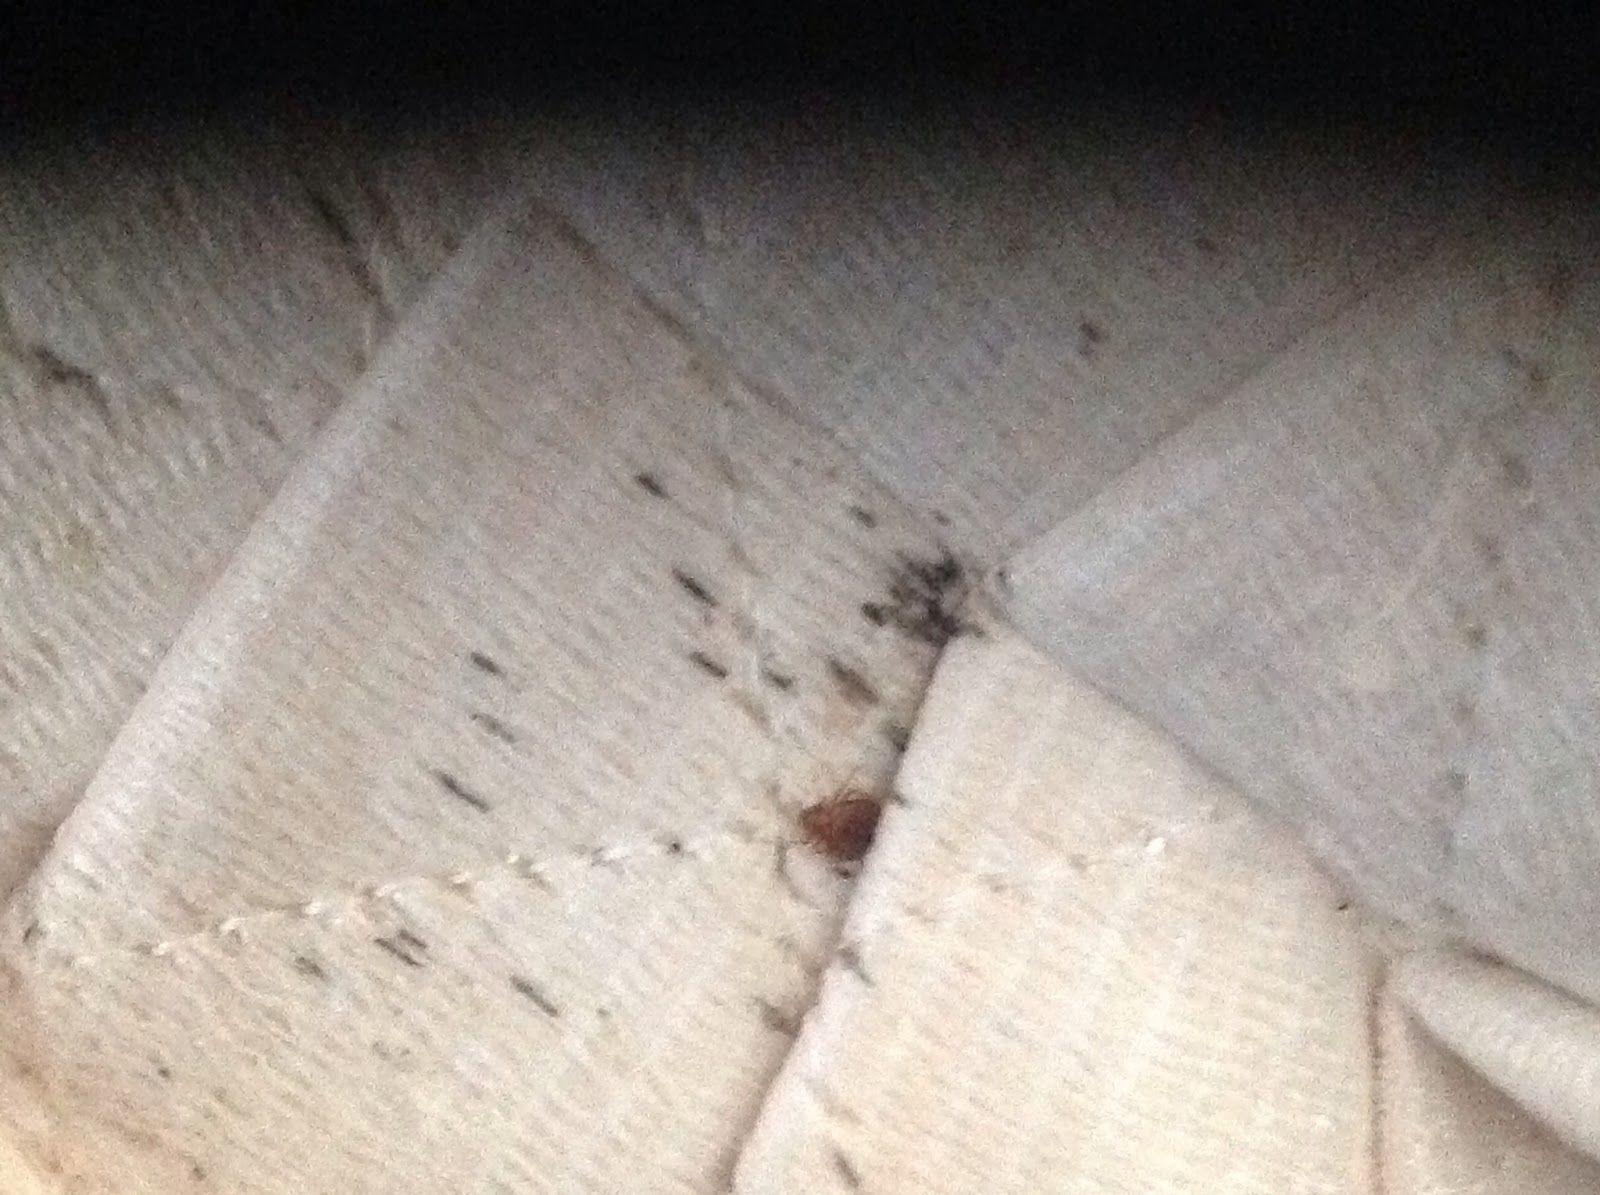 AtlantaMaconAugustaAthens Bed Bugs Blog Bed